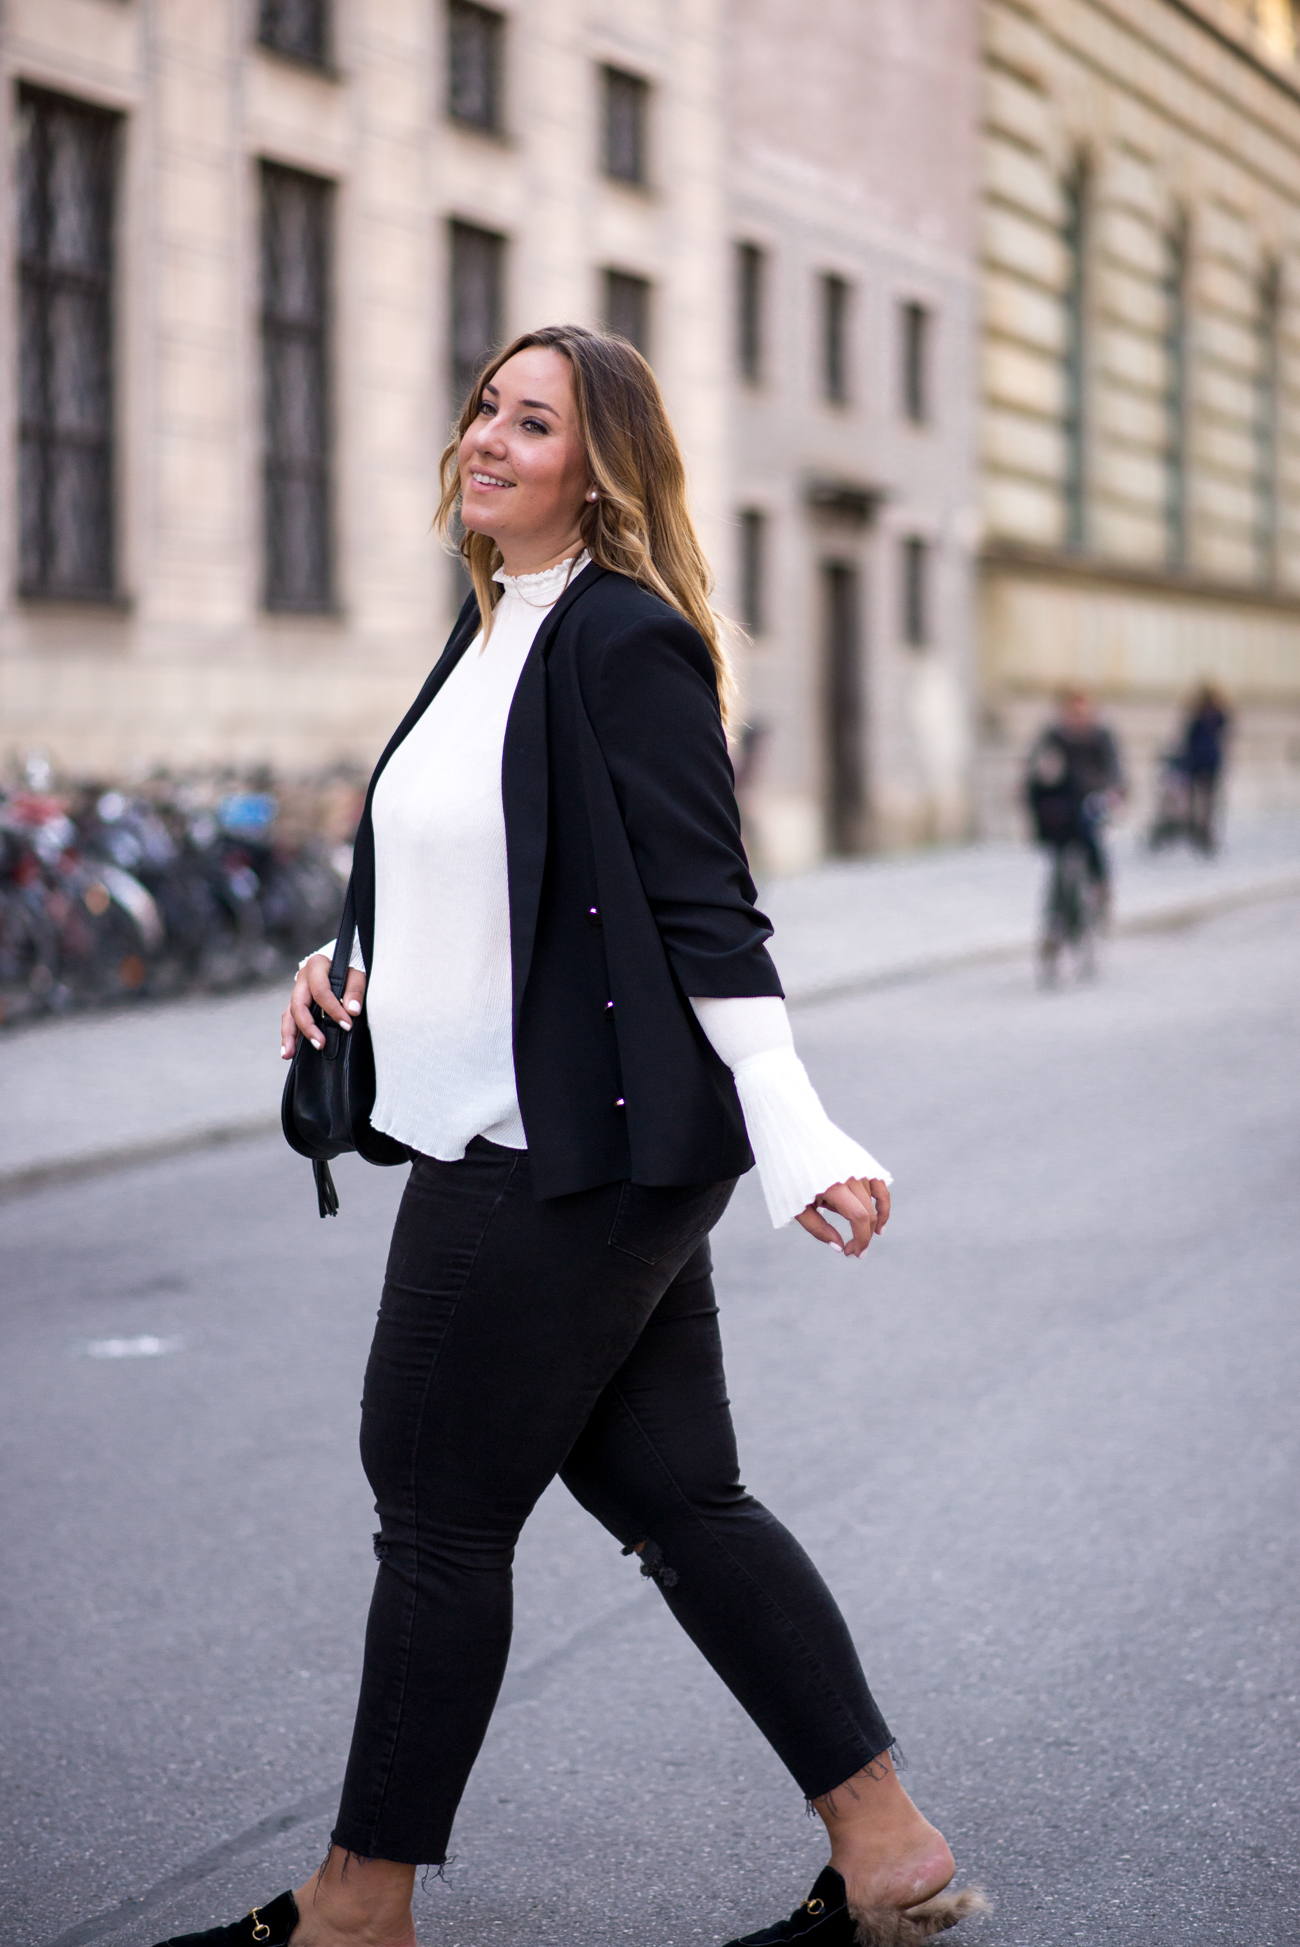 gucci-slipper_gucci-princetown_skinny-and-the-curvy-one_plus_plus-size-blogger_fashion_blogger-deutschland_fashionblogger-munich_curve-14-von-21